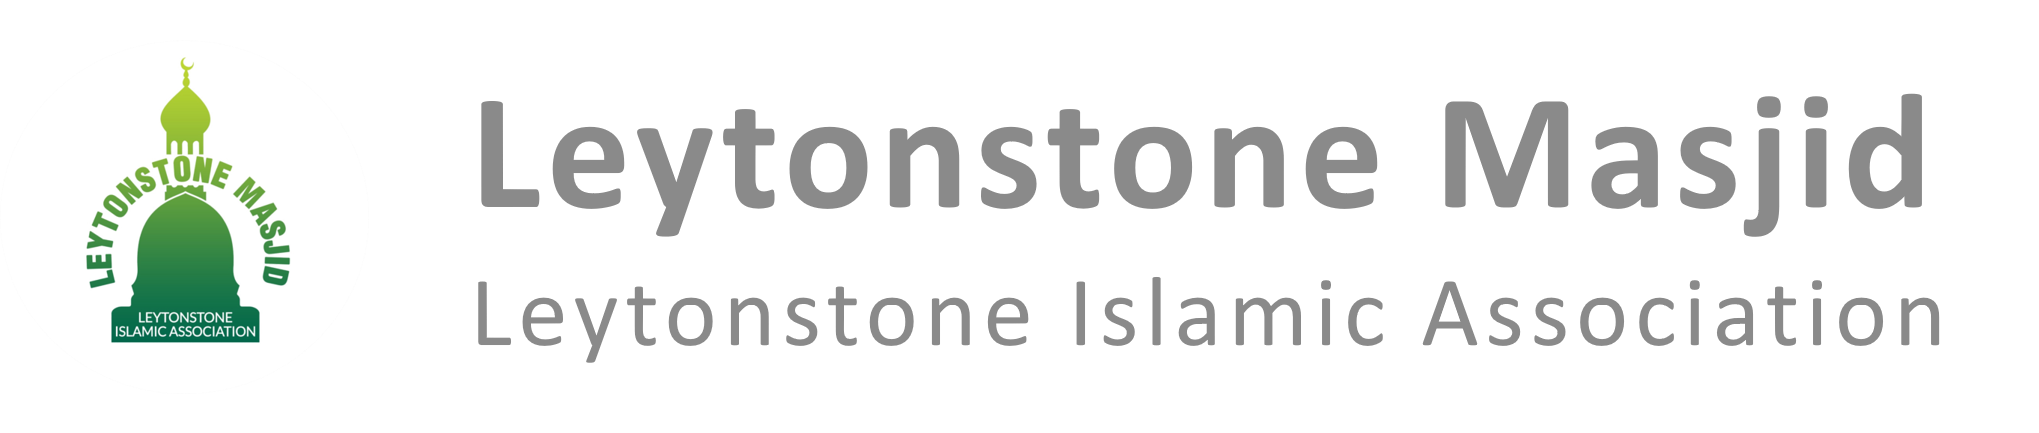 Leytonstone Masjid